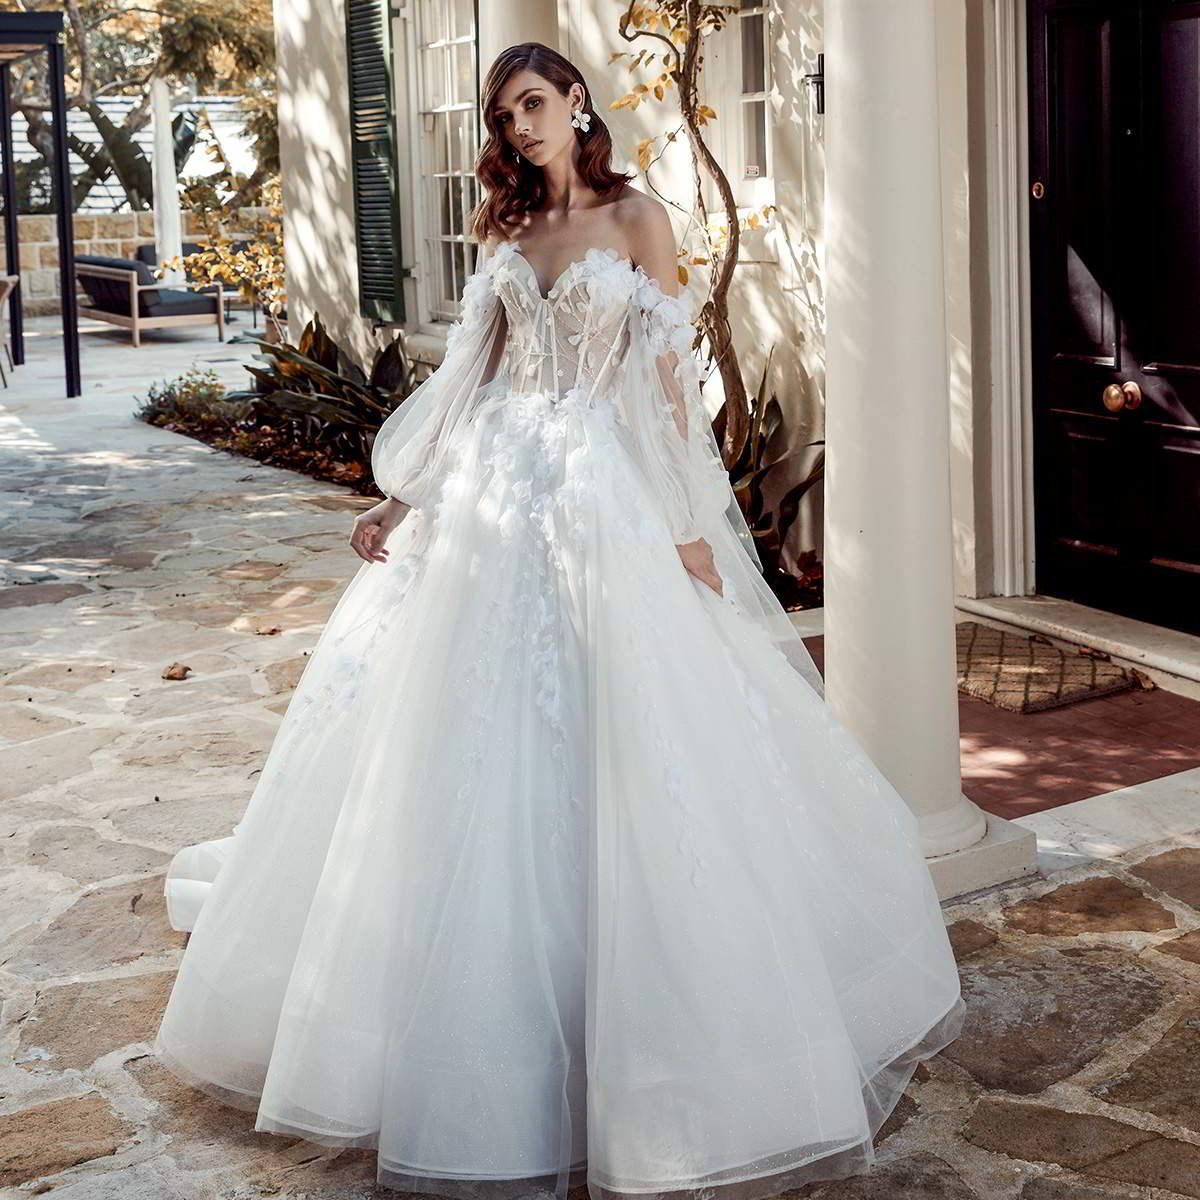 váy cưới chiết eo leah da gloria 2020